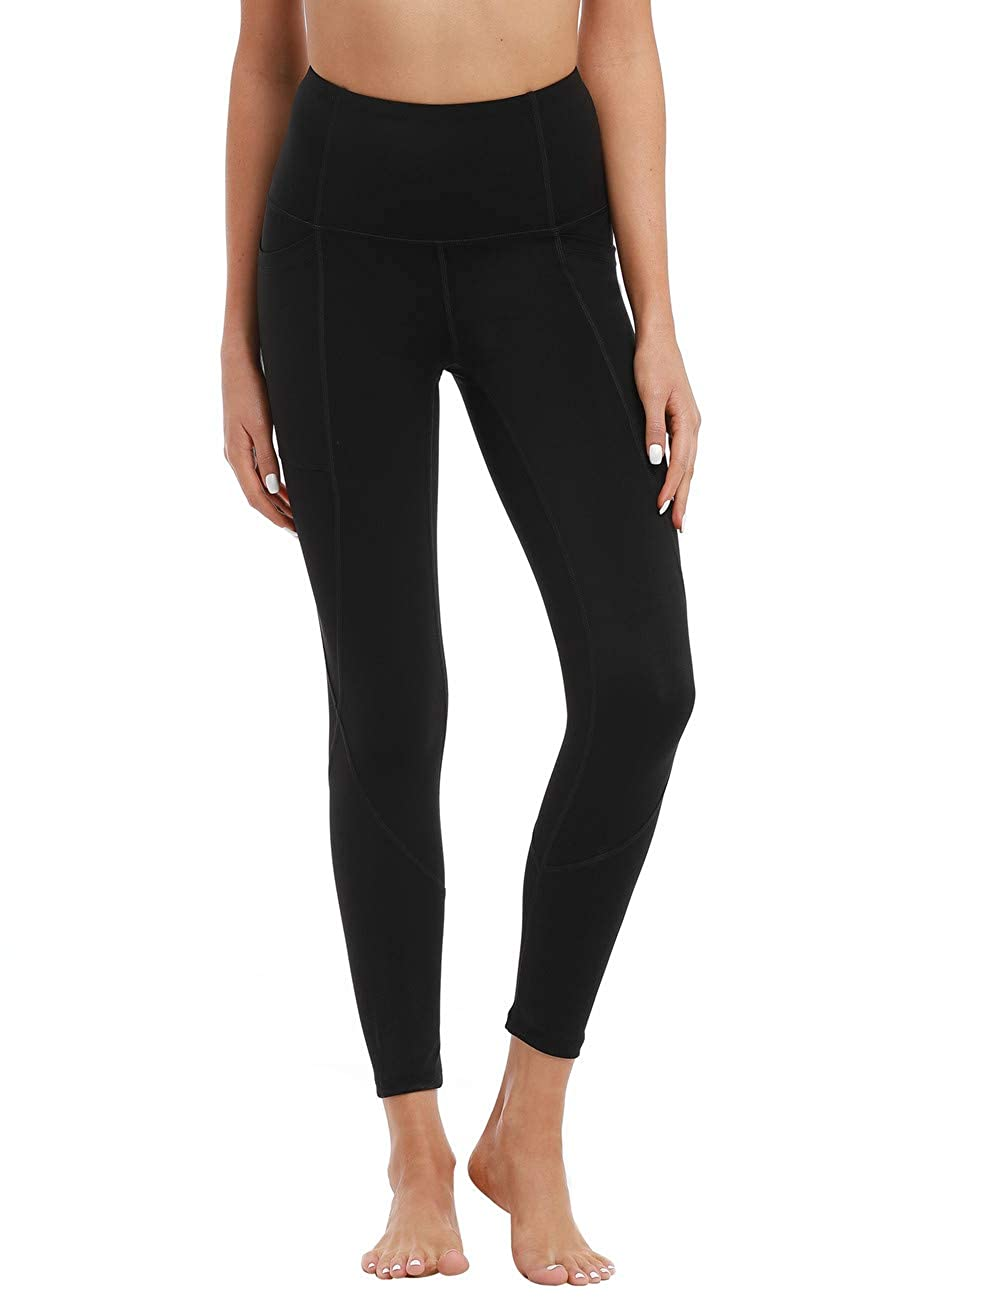 Hopgo Womens High Waist Workout Leggings Power Flex Yoga Pants Tummy Control 7//8 Sports Tights Side Pocket